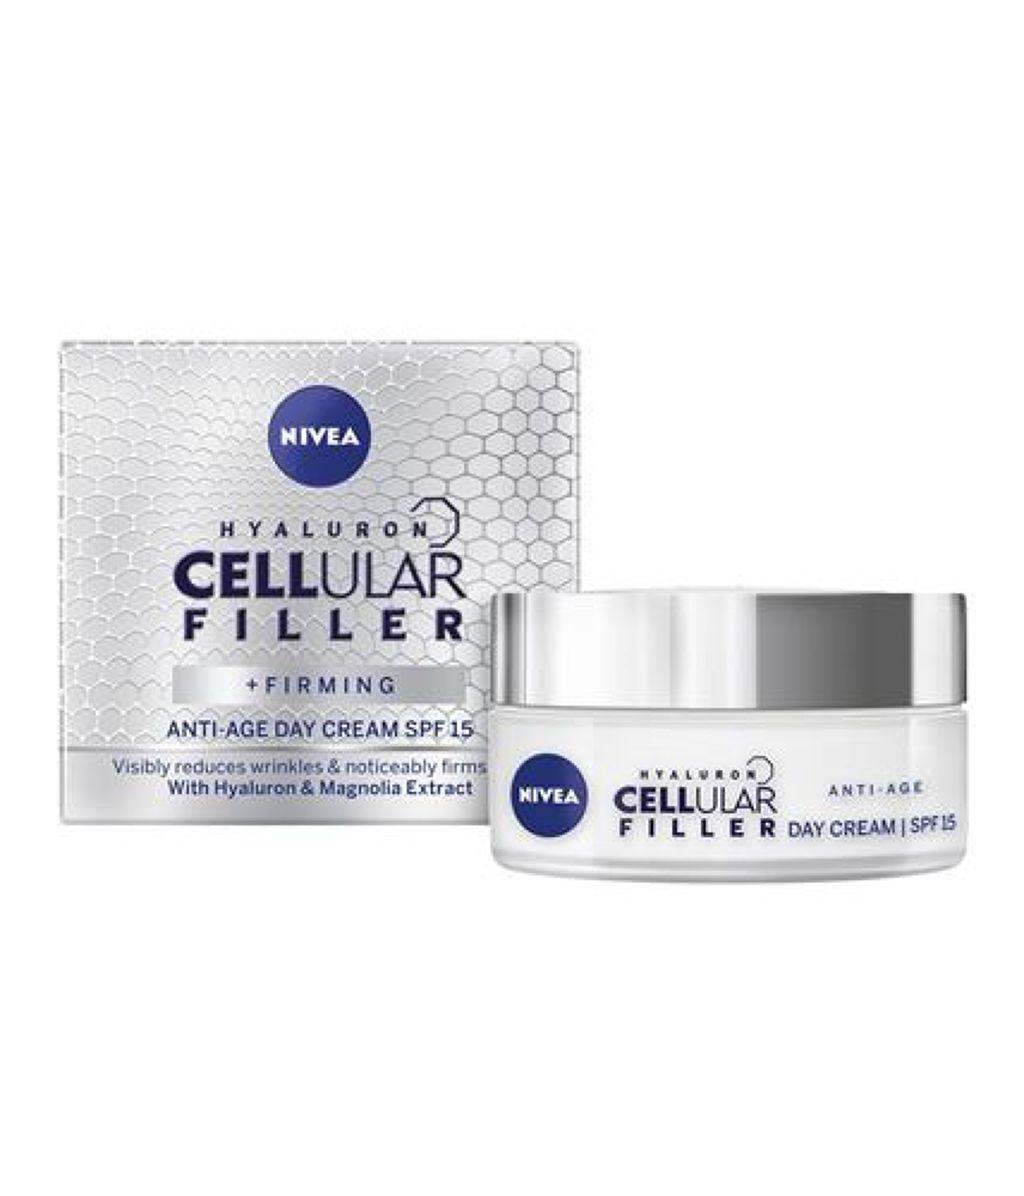 Hyaluron Cellular Filler Day Cream (Anti-age) / ニベアのリアルな ...